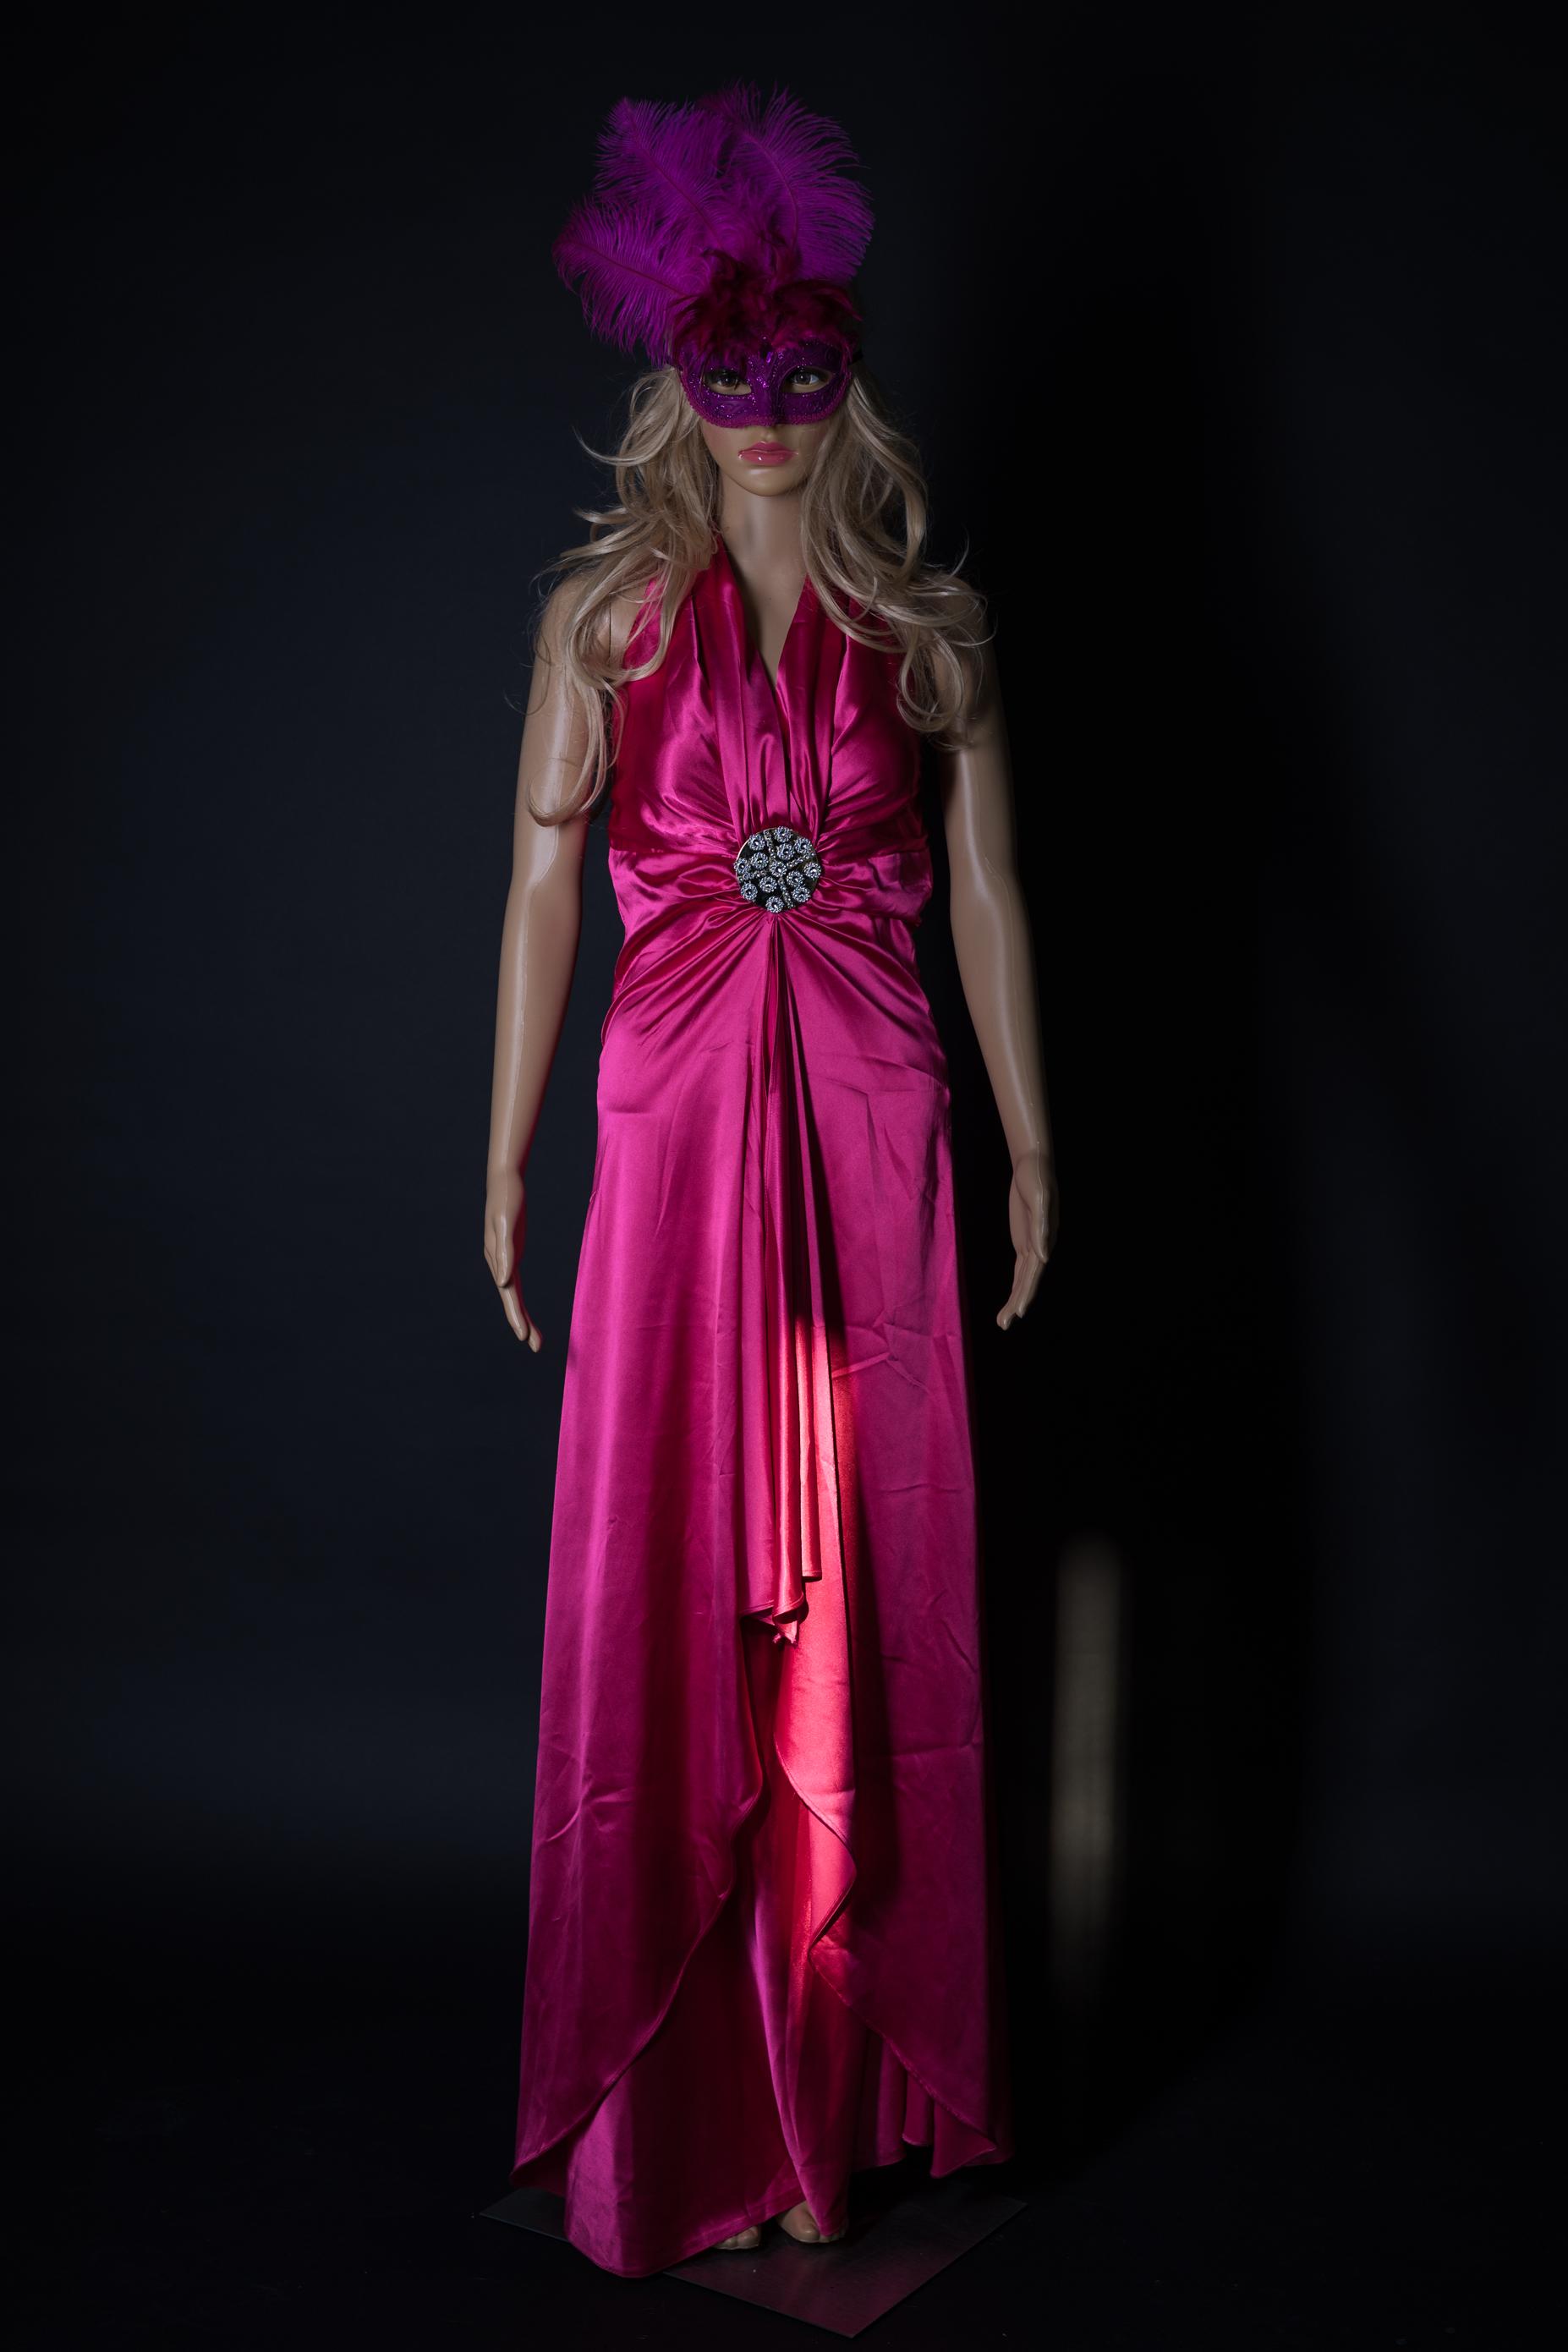 Pinkes Kleid Fantasy